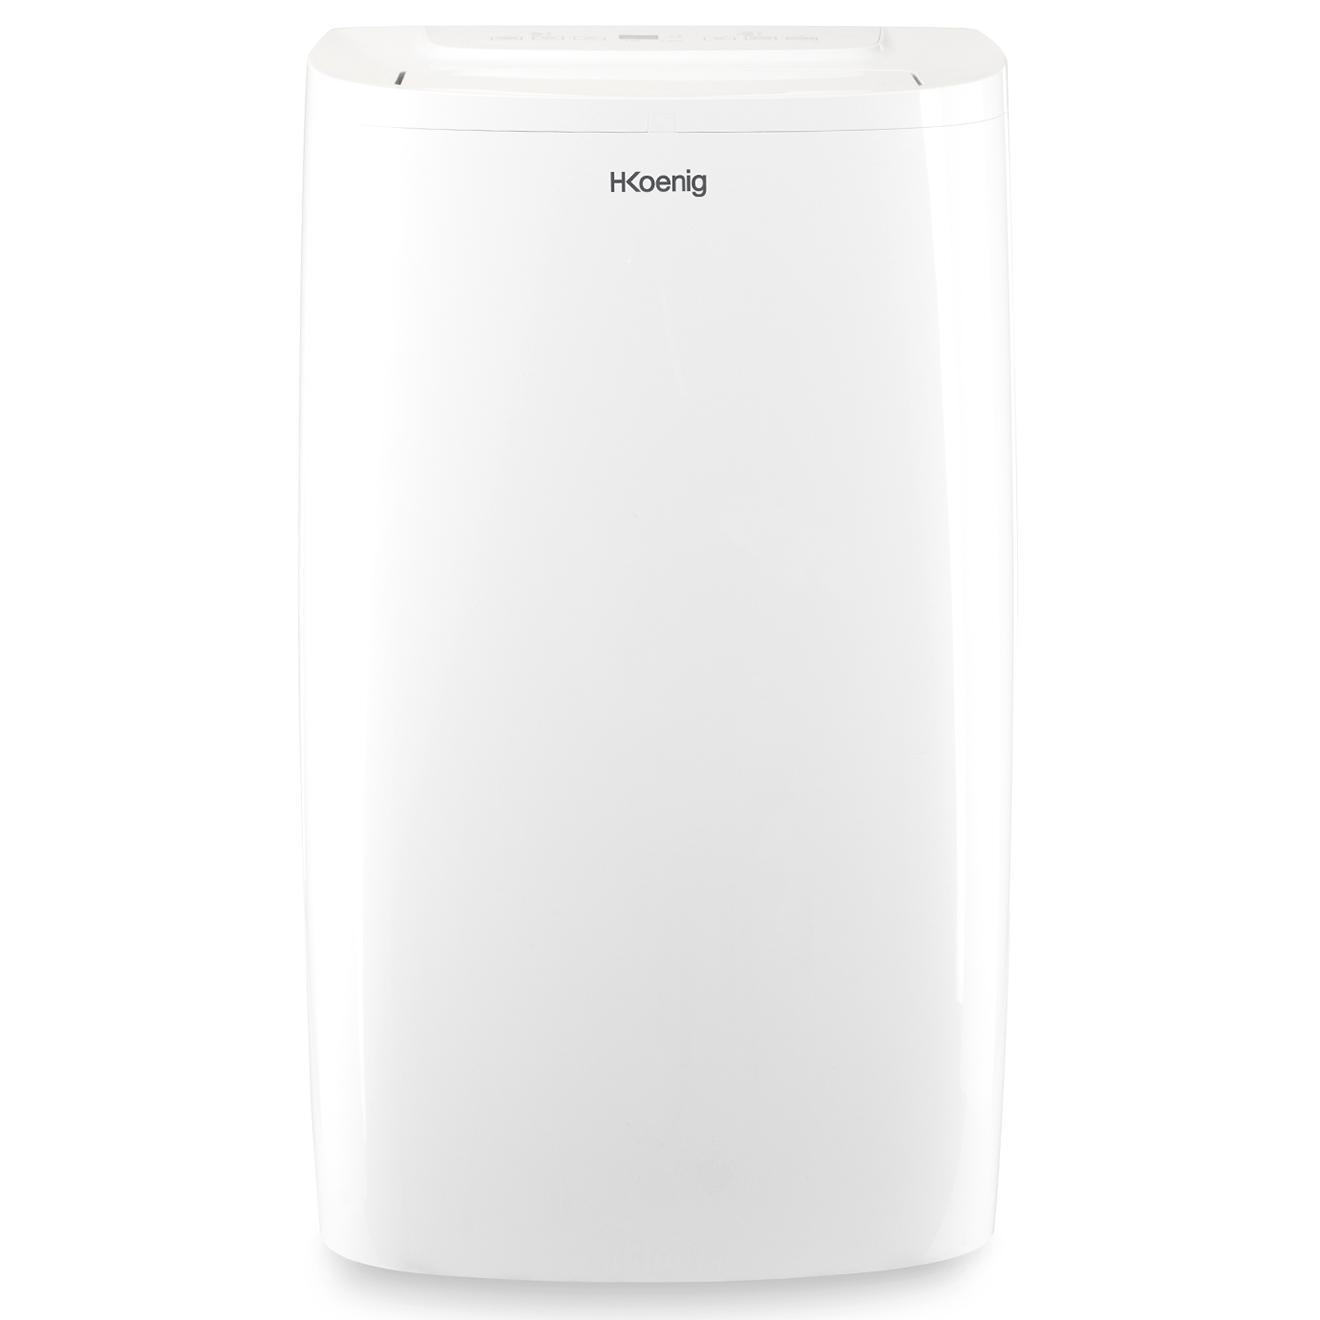 Silent + -blanc - 3520W - Climatiseur mobile